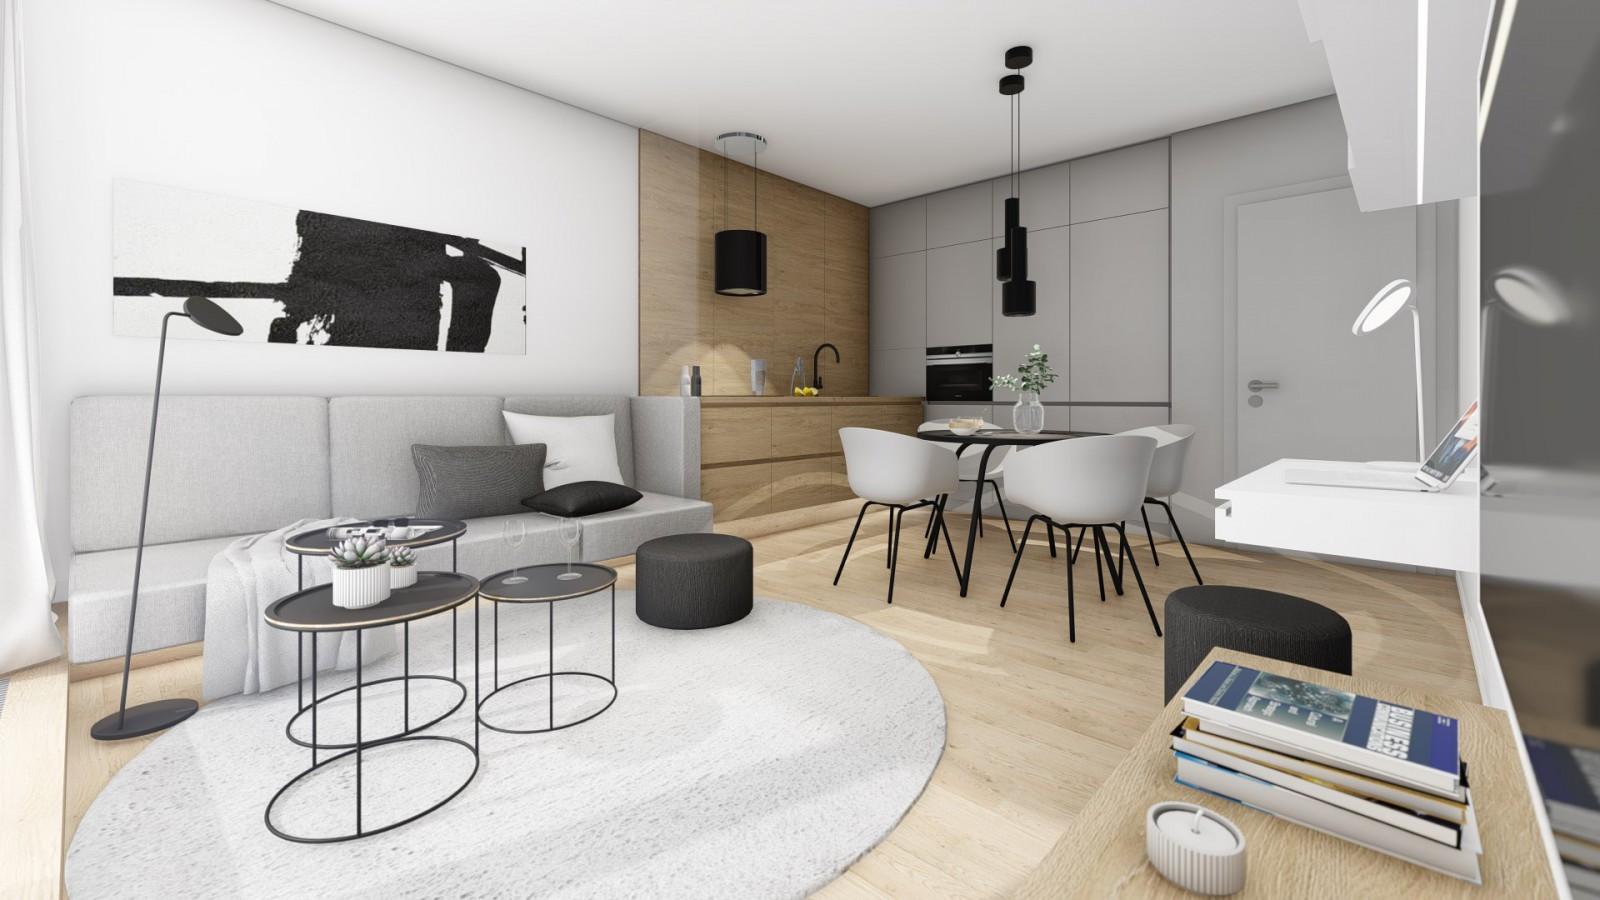 navrh navrhovany navrzeny interier interierovy interieru design designovy architekt architekti architektonicky moderni moderniho skandinavsky skandinavskeho skandinavskem stylu stylovy styloveho